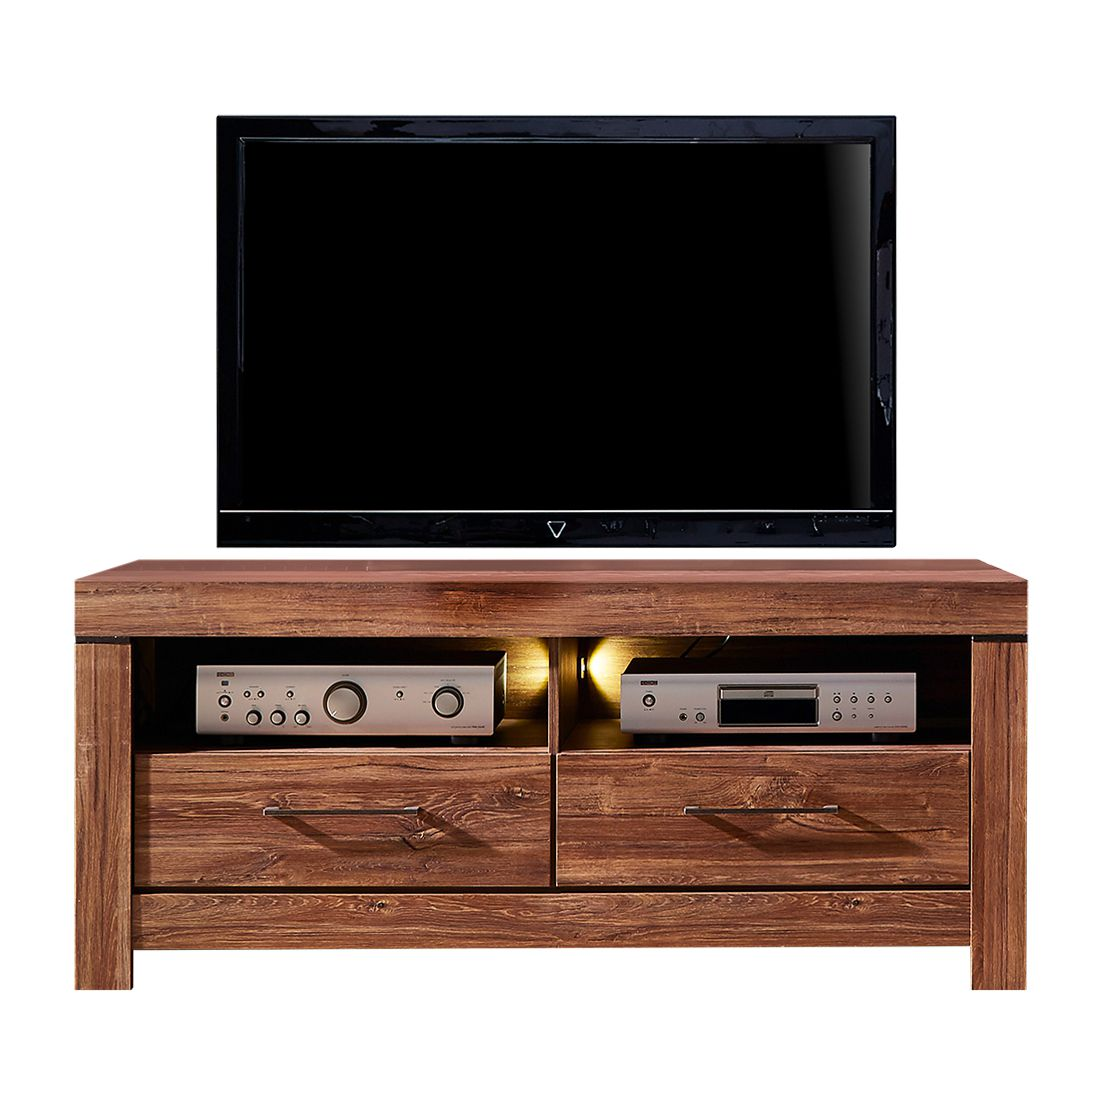 lowboard kolonial preisvergleich die besten angebote online kaufen. Black Bedroom Furniture Sets. Home Design Ideas